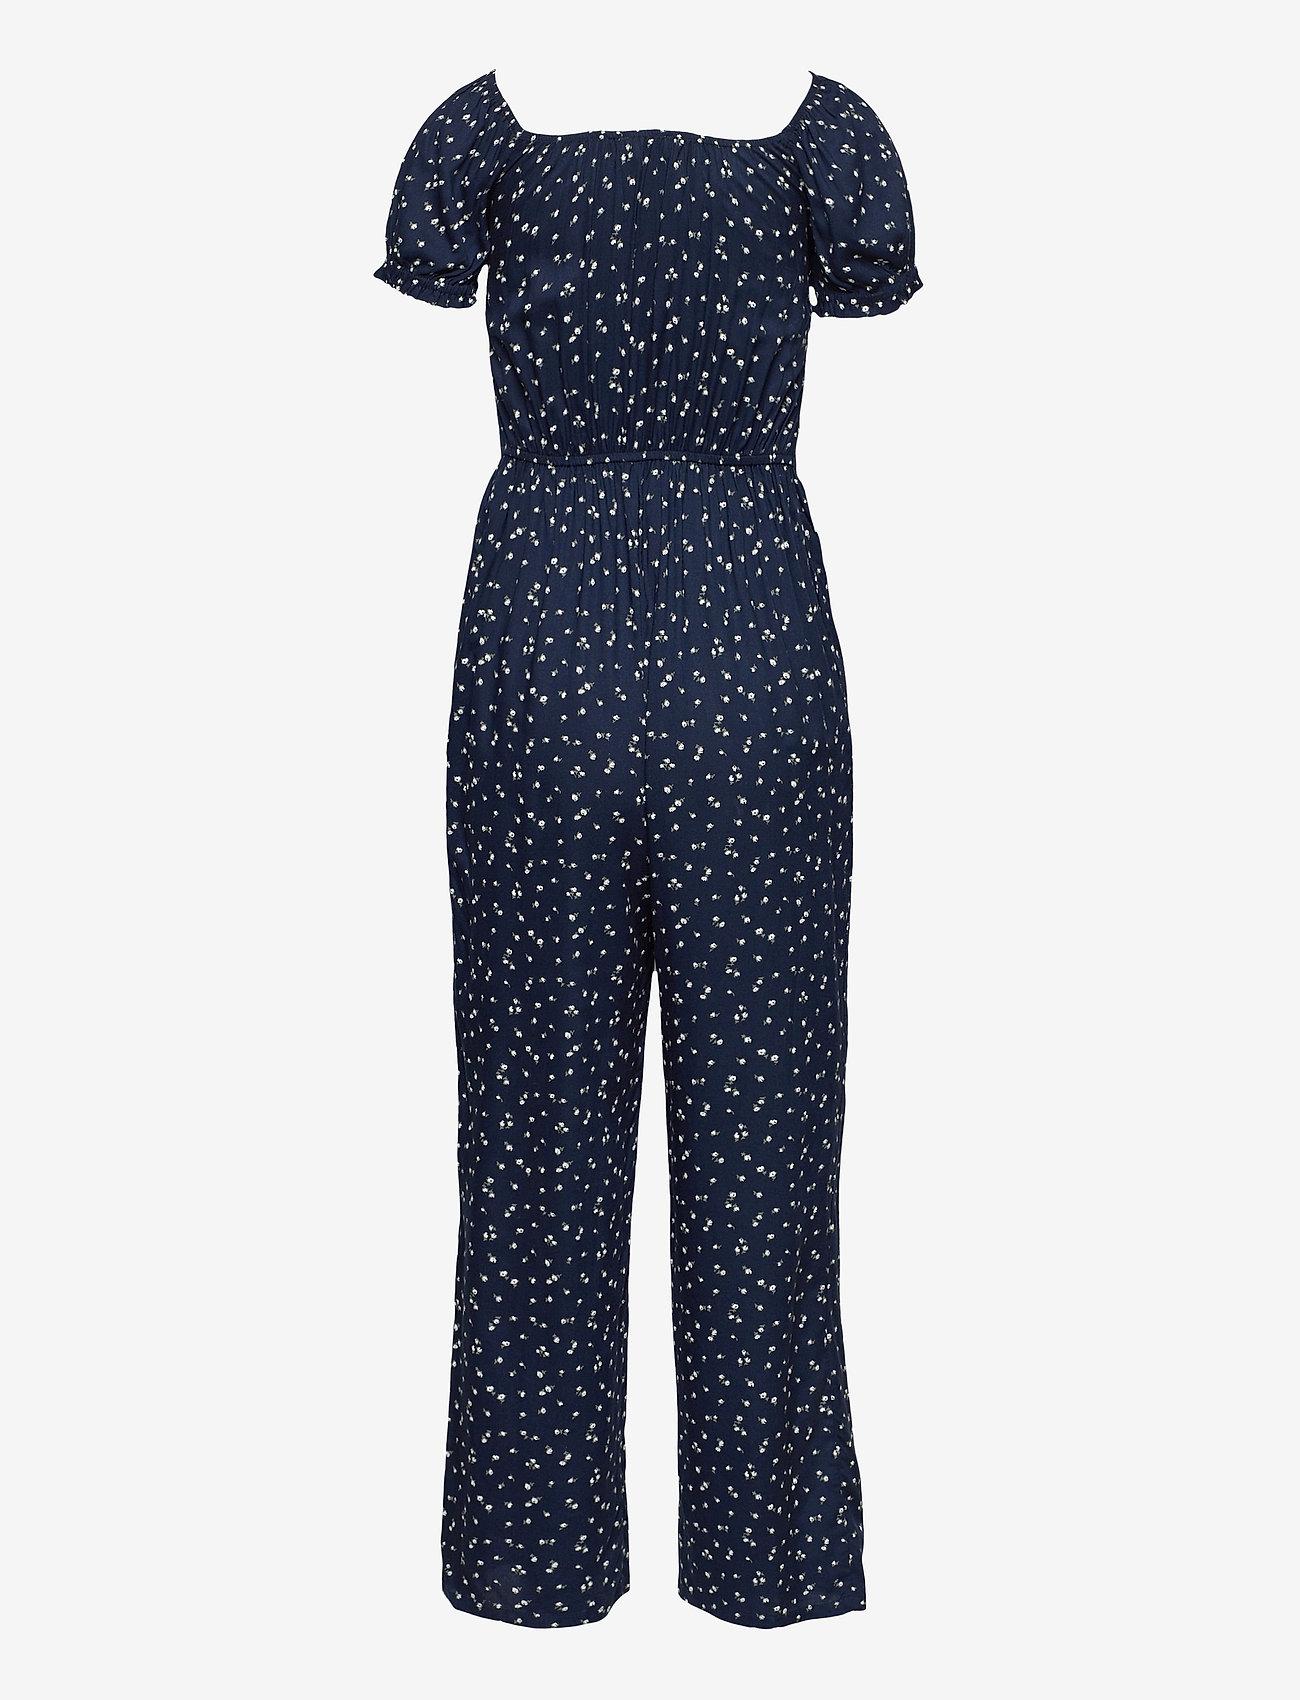 Hollister - HCo. GIRLS DRESSES - jumpsuits - navy floral - 1